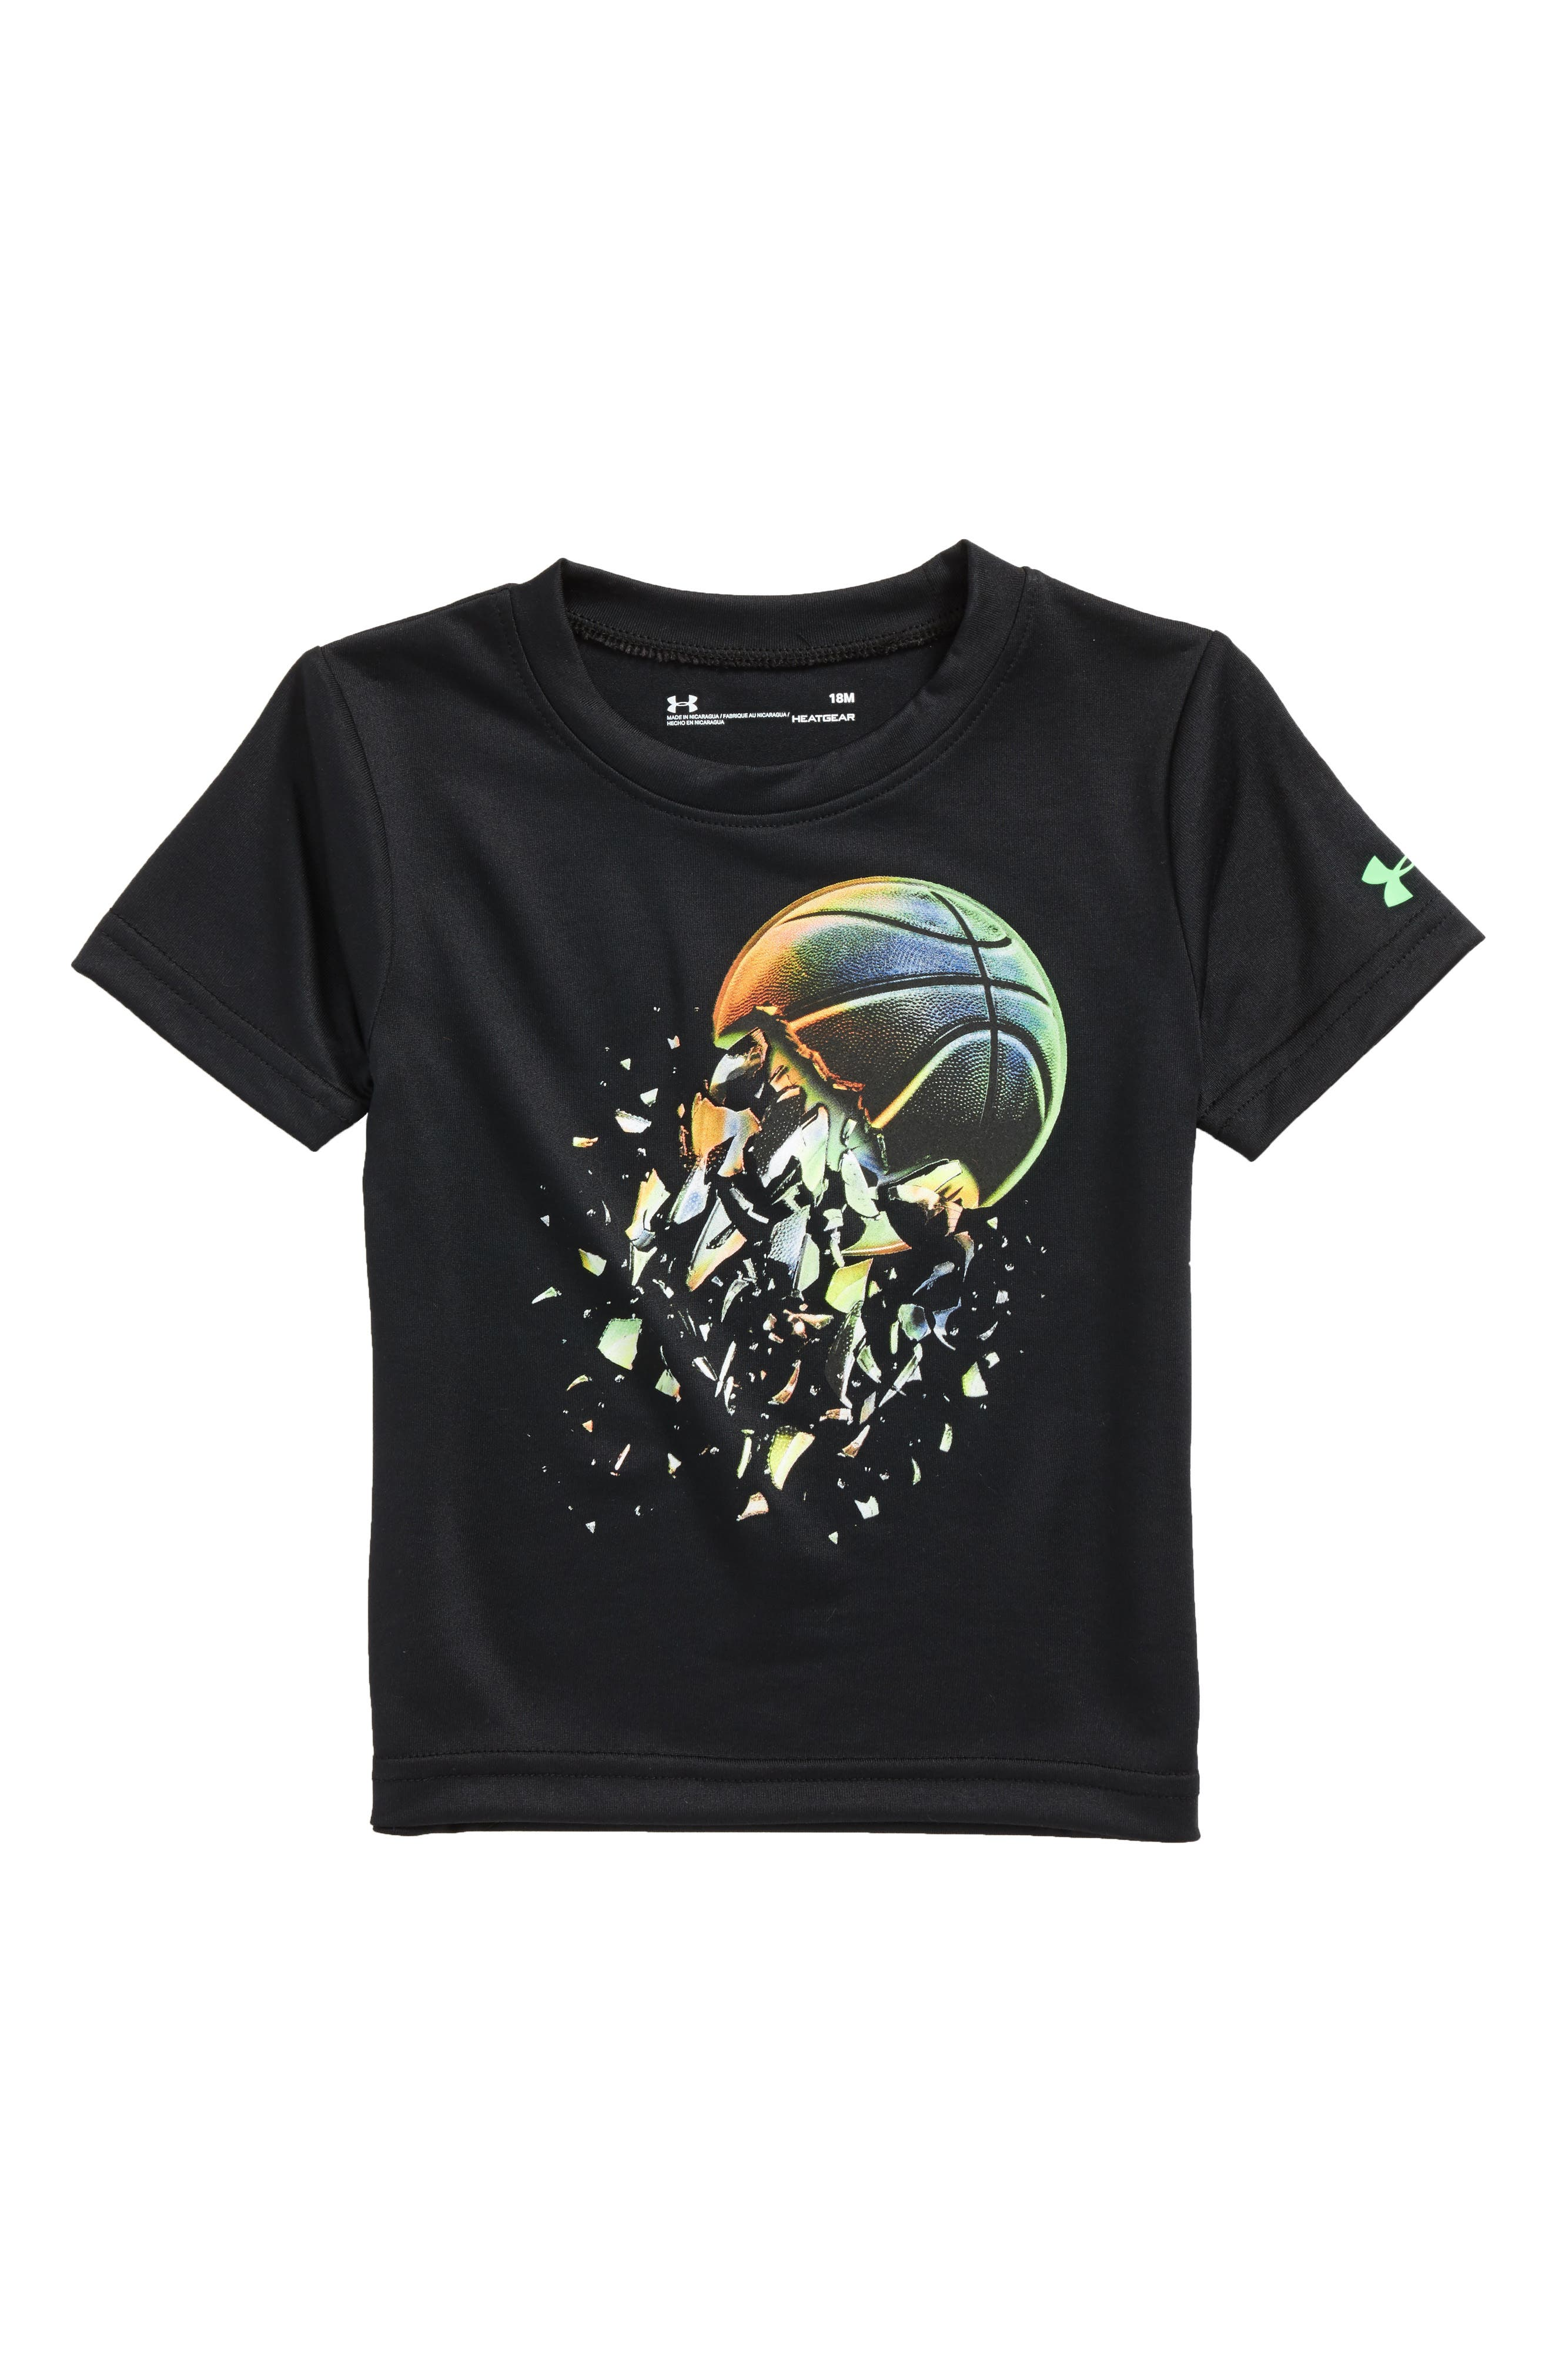 Under Armour Basketball Explosion Graphic HeatGear® T-Shirt (Baby Boys)